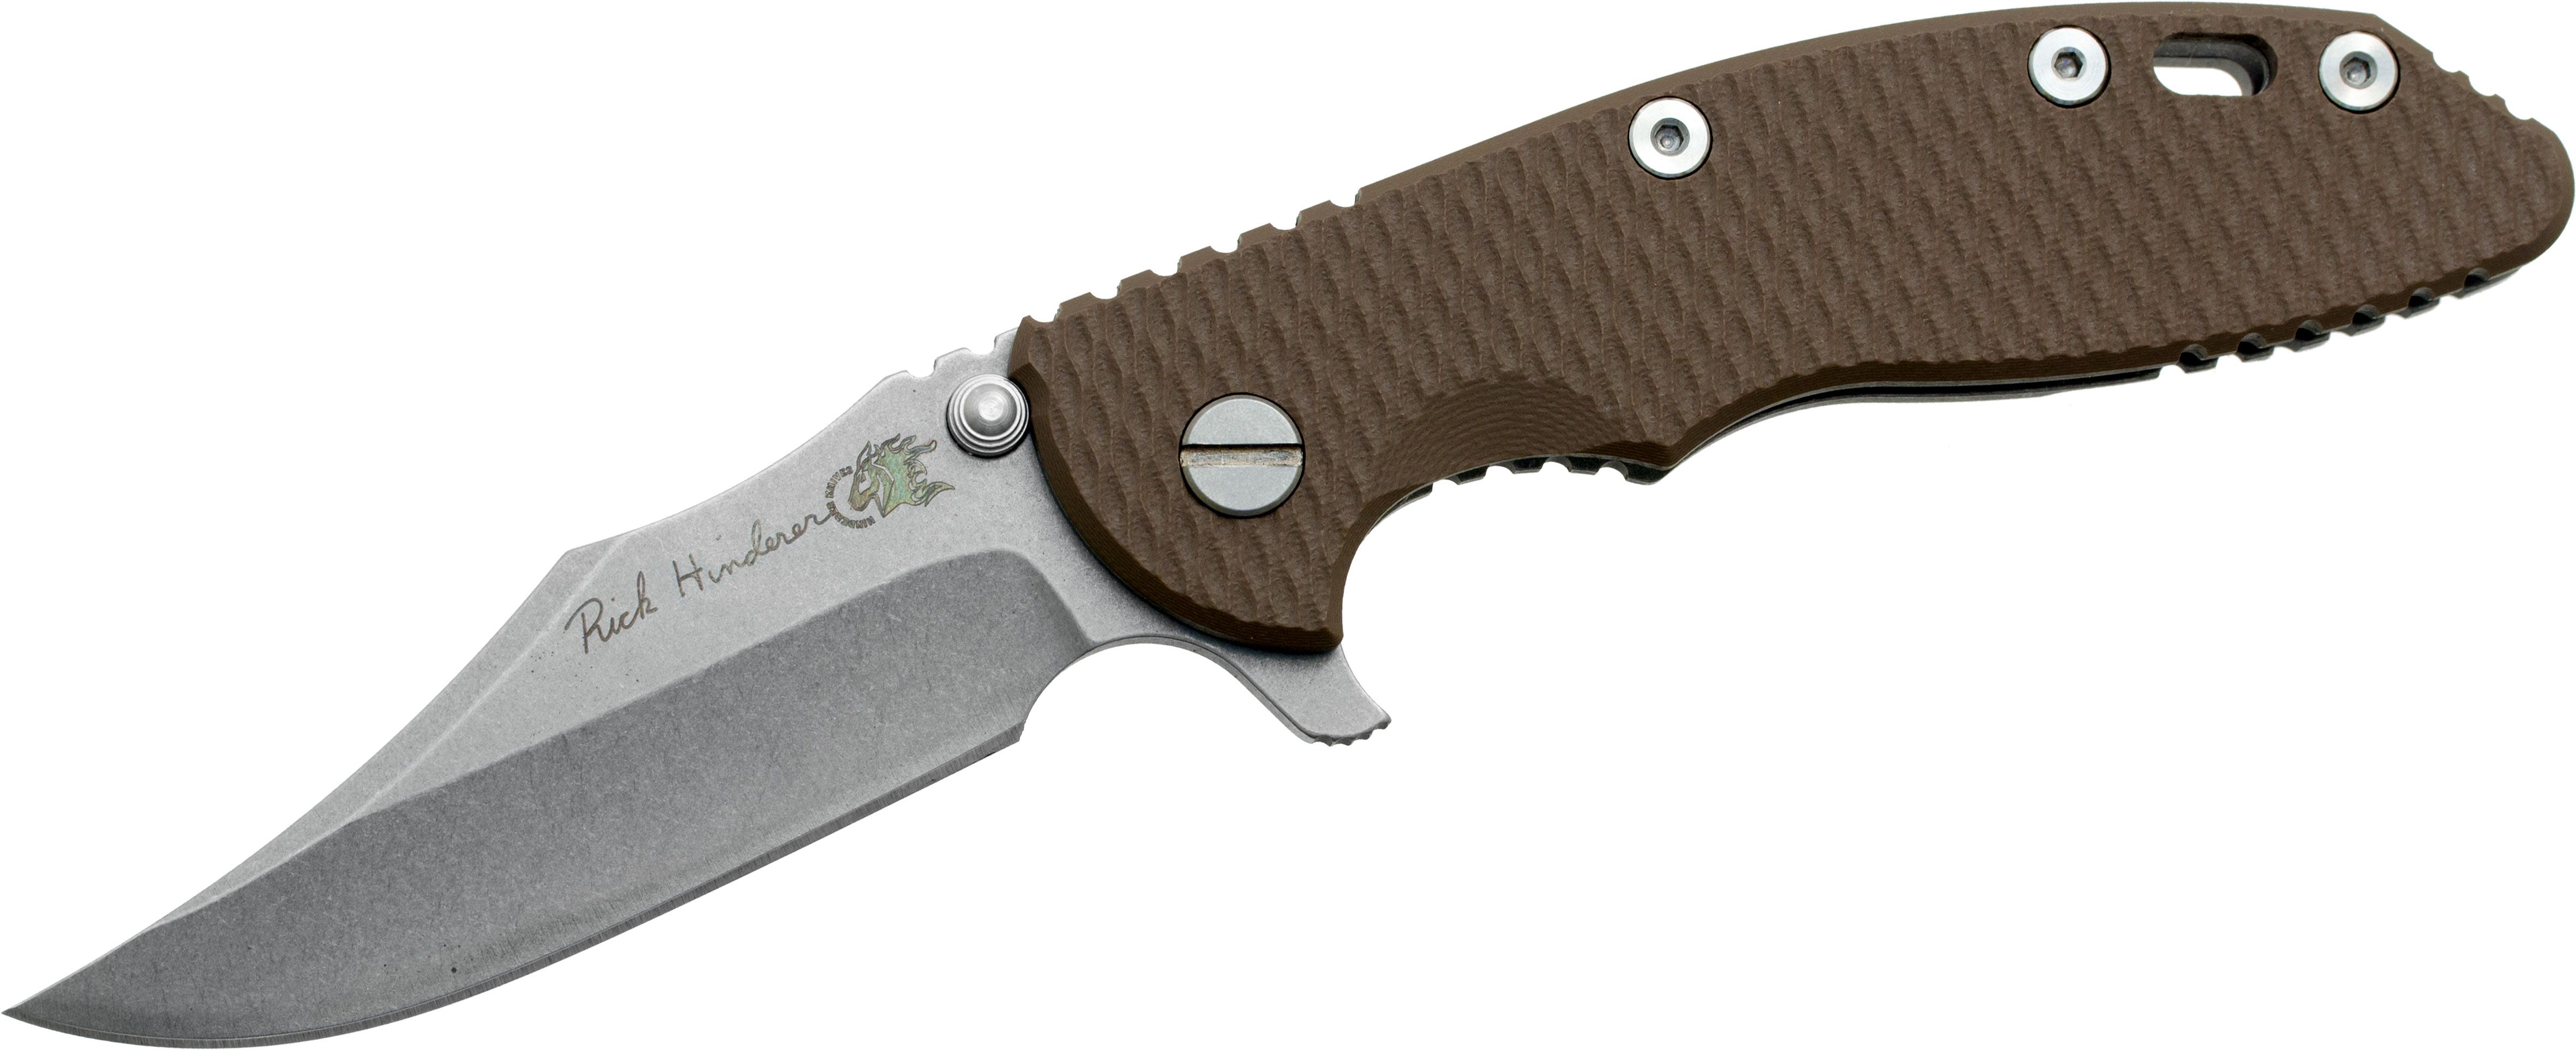 Rick Hinderer Custom XM-18 3.5 inch Flipper, S35VN Bowie Blade, Flat Dark Earth G10 Handle, Copper Hardware